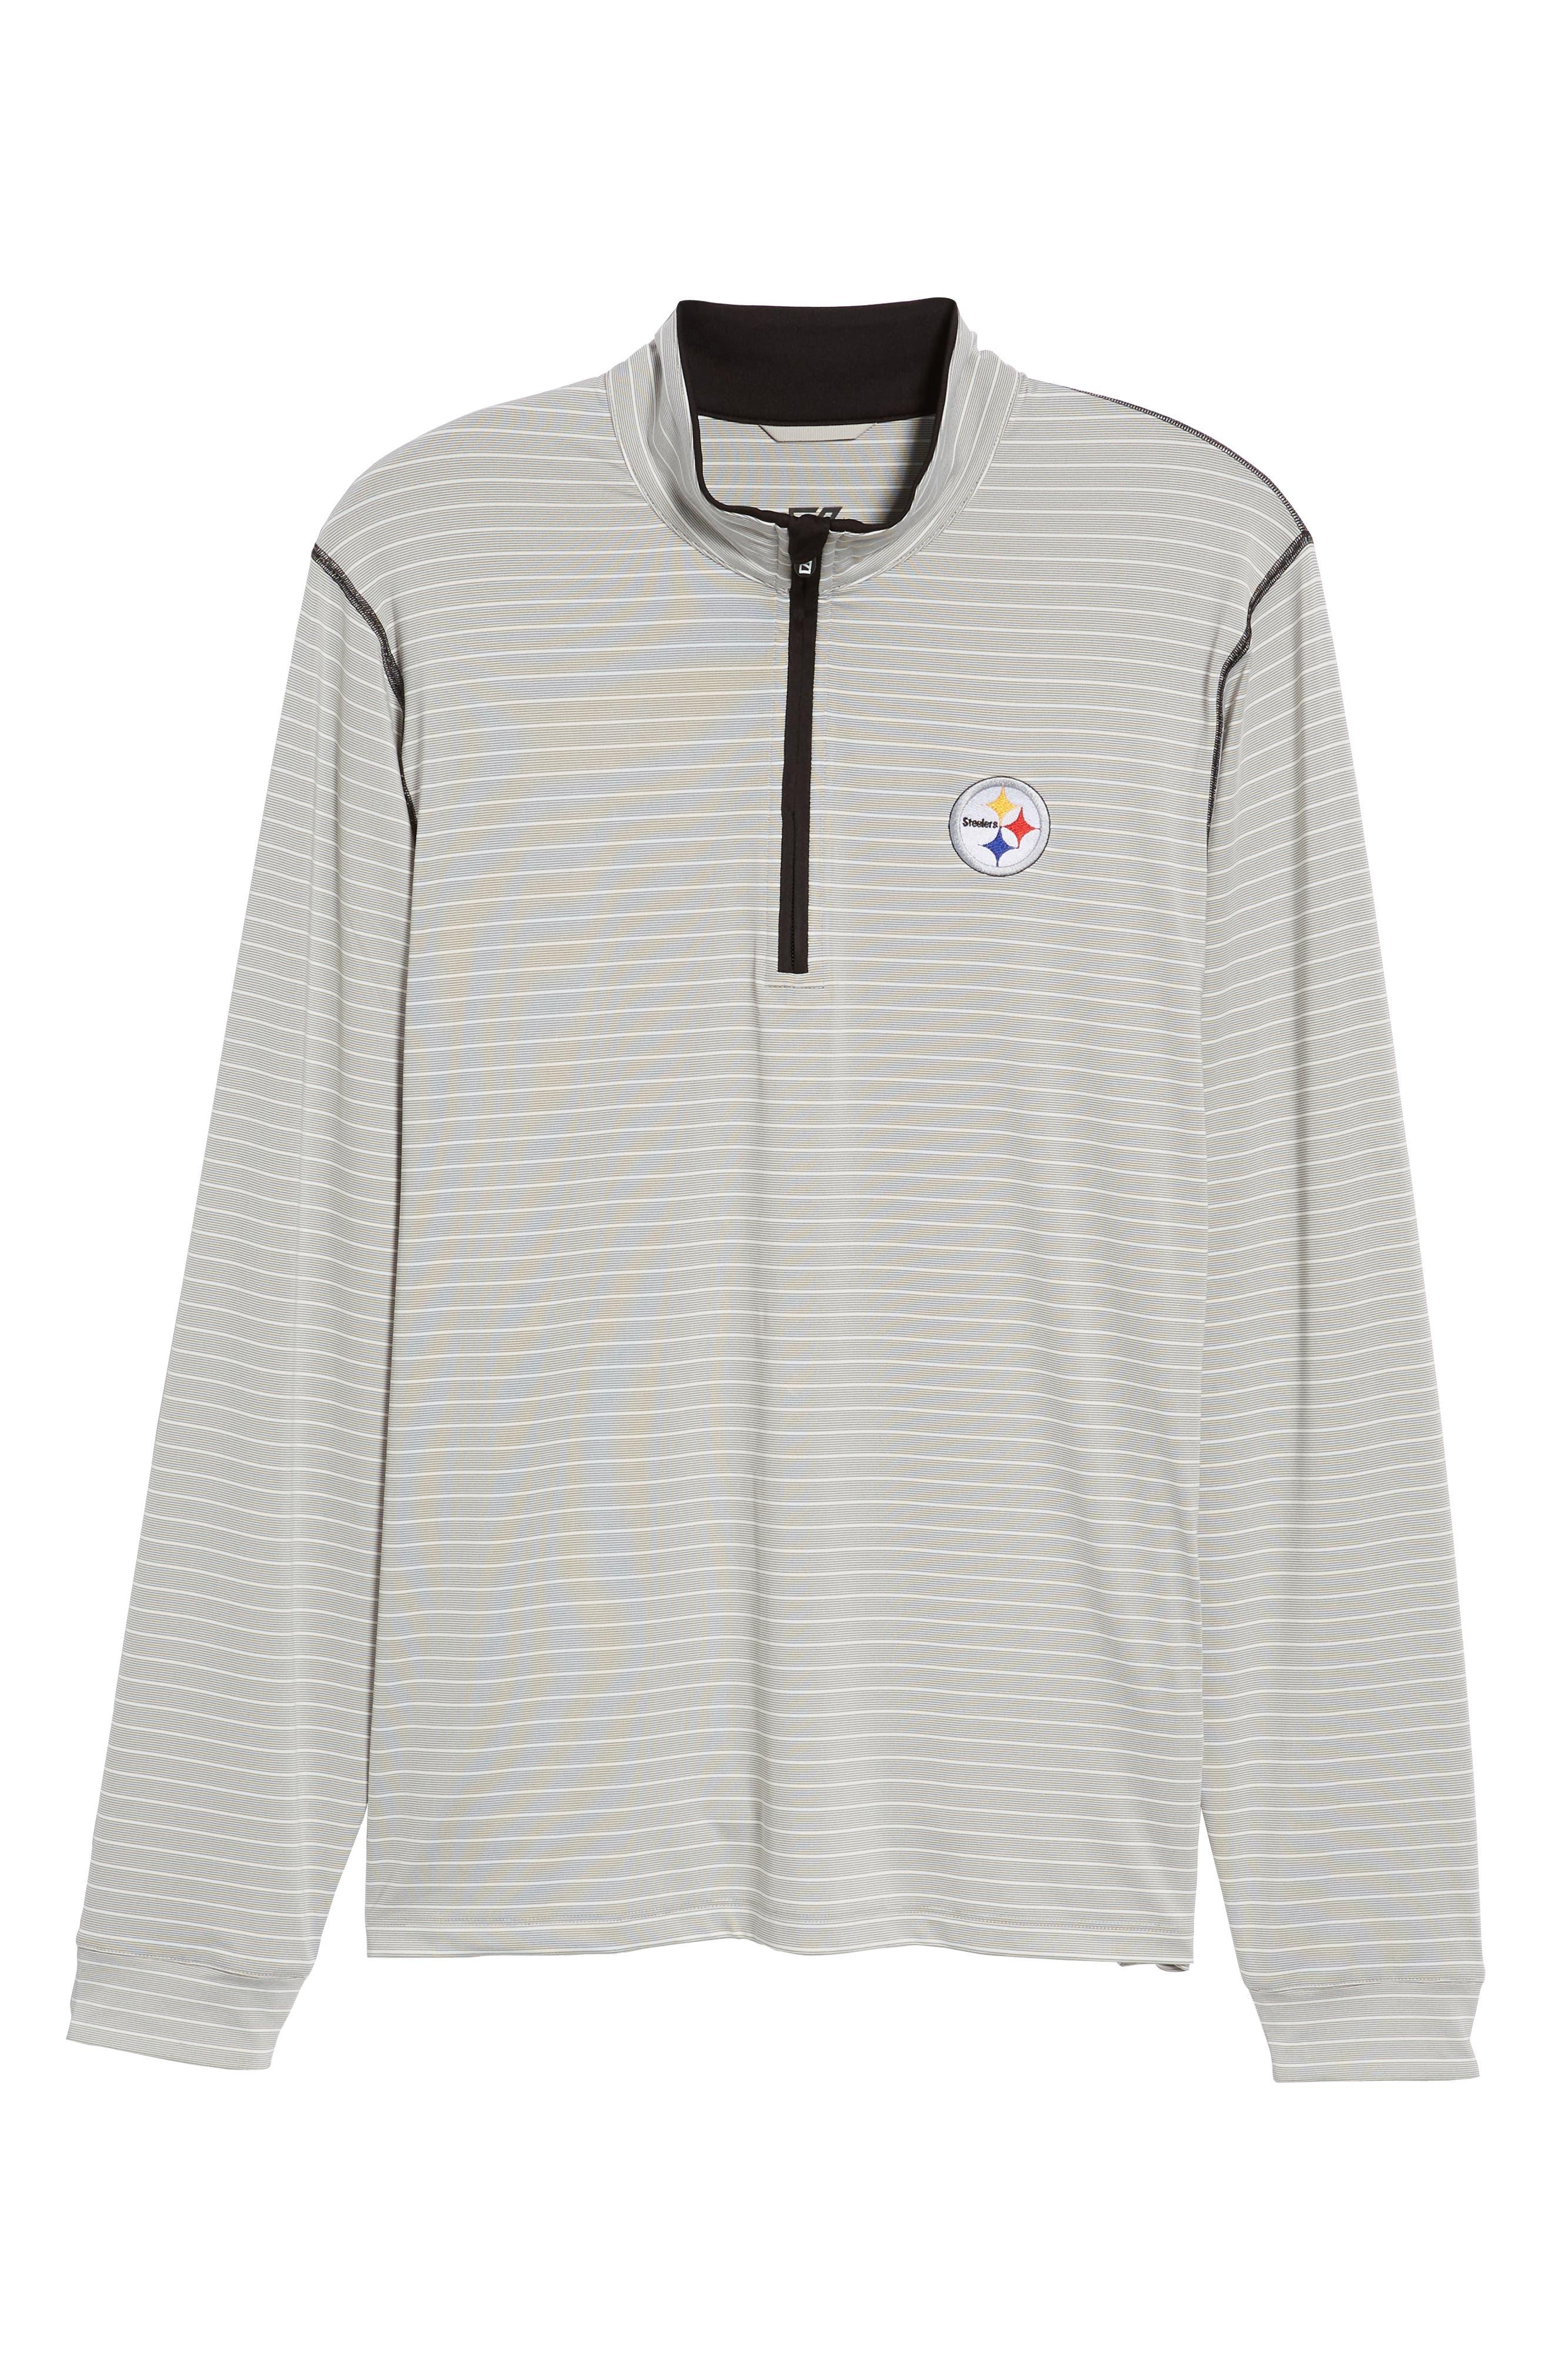 Meridian - Pittsburgh Steelers Regular Fit Half Zip Pullover,                             Alternate thumbnail 6, color,                             BLACK